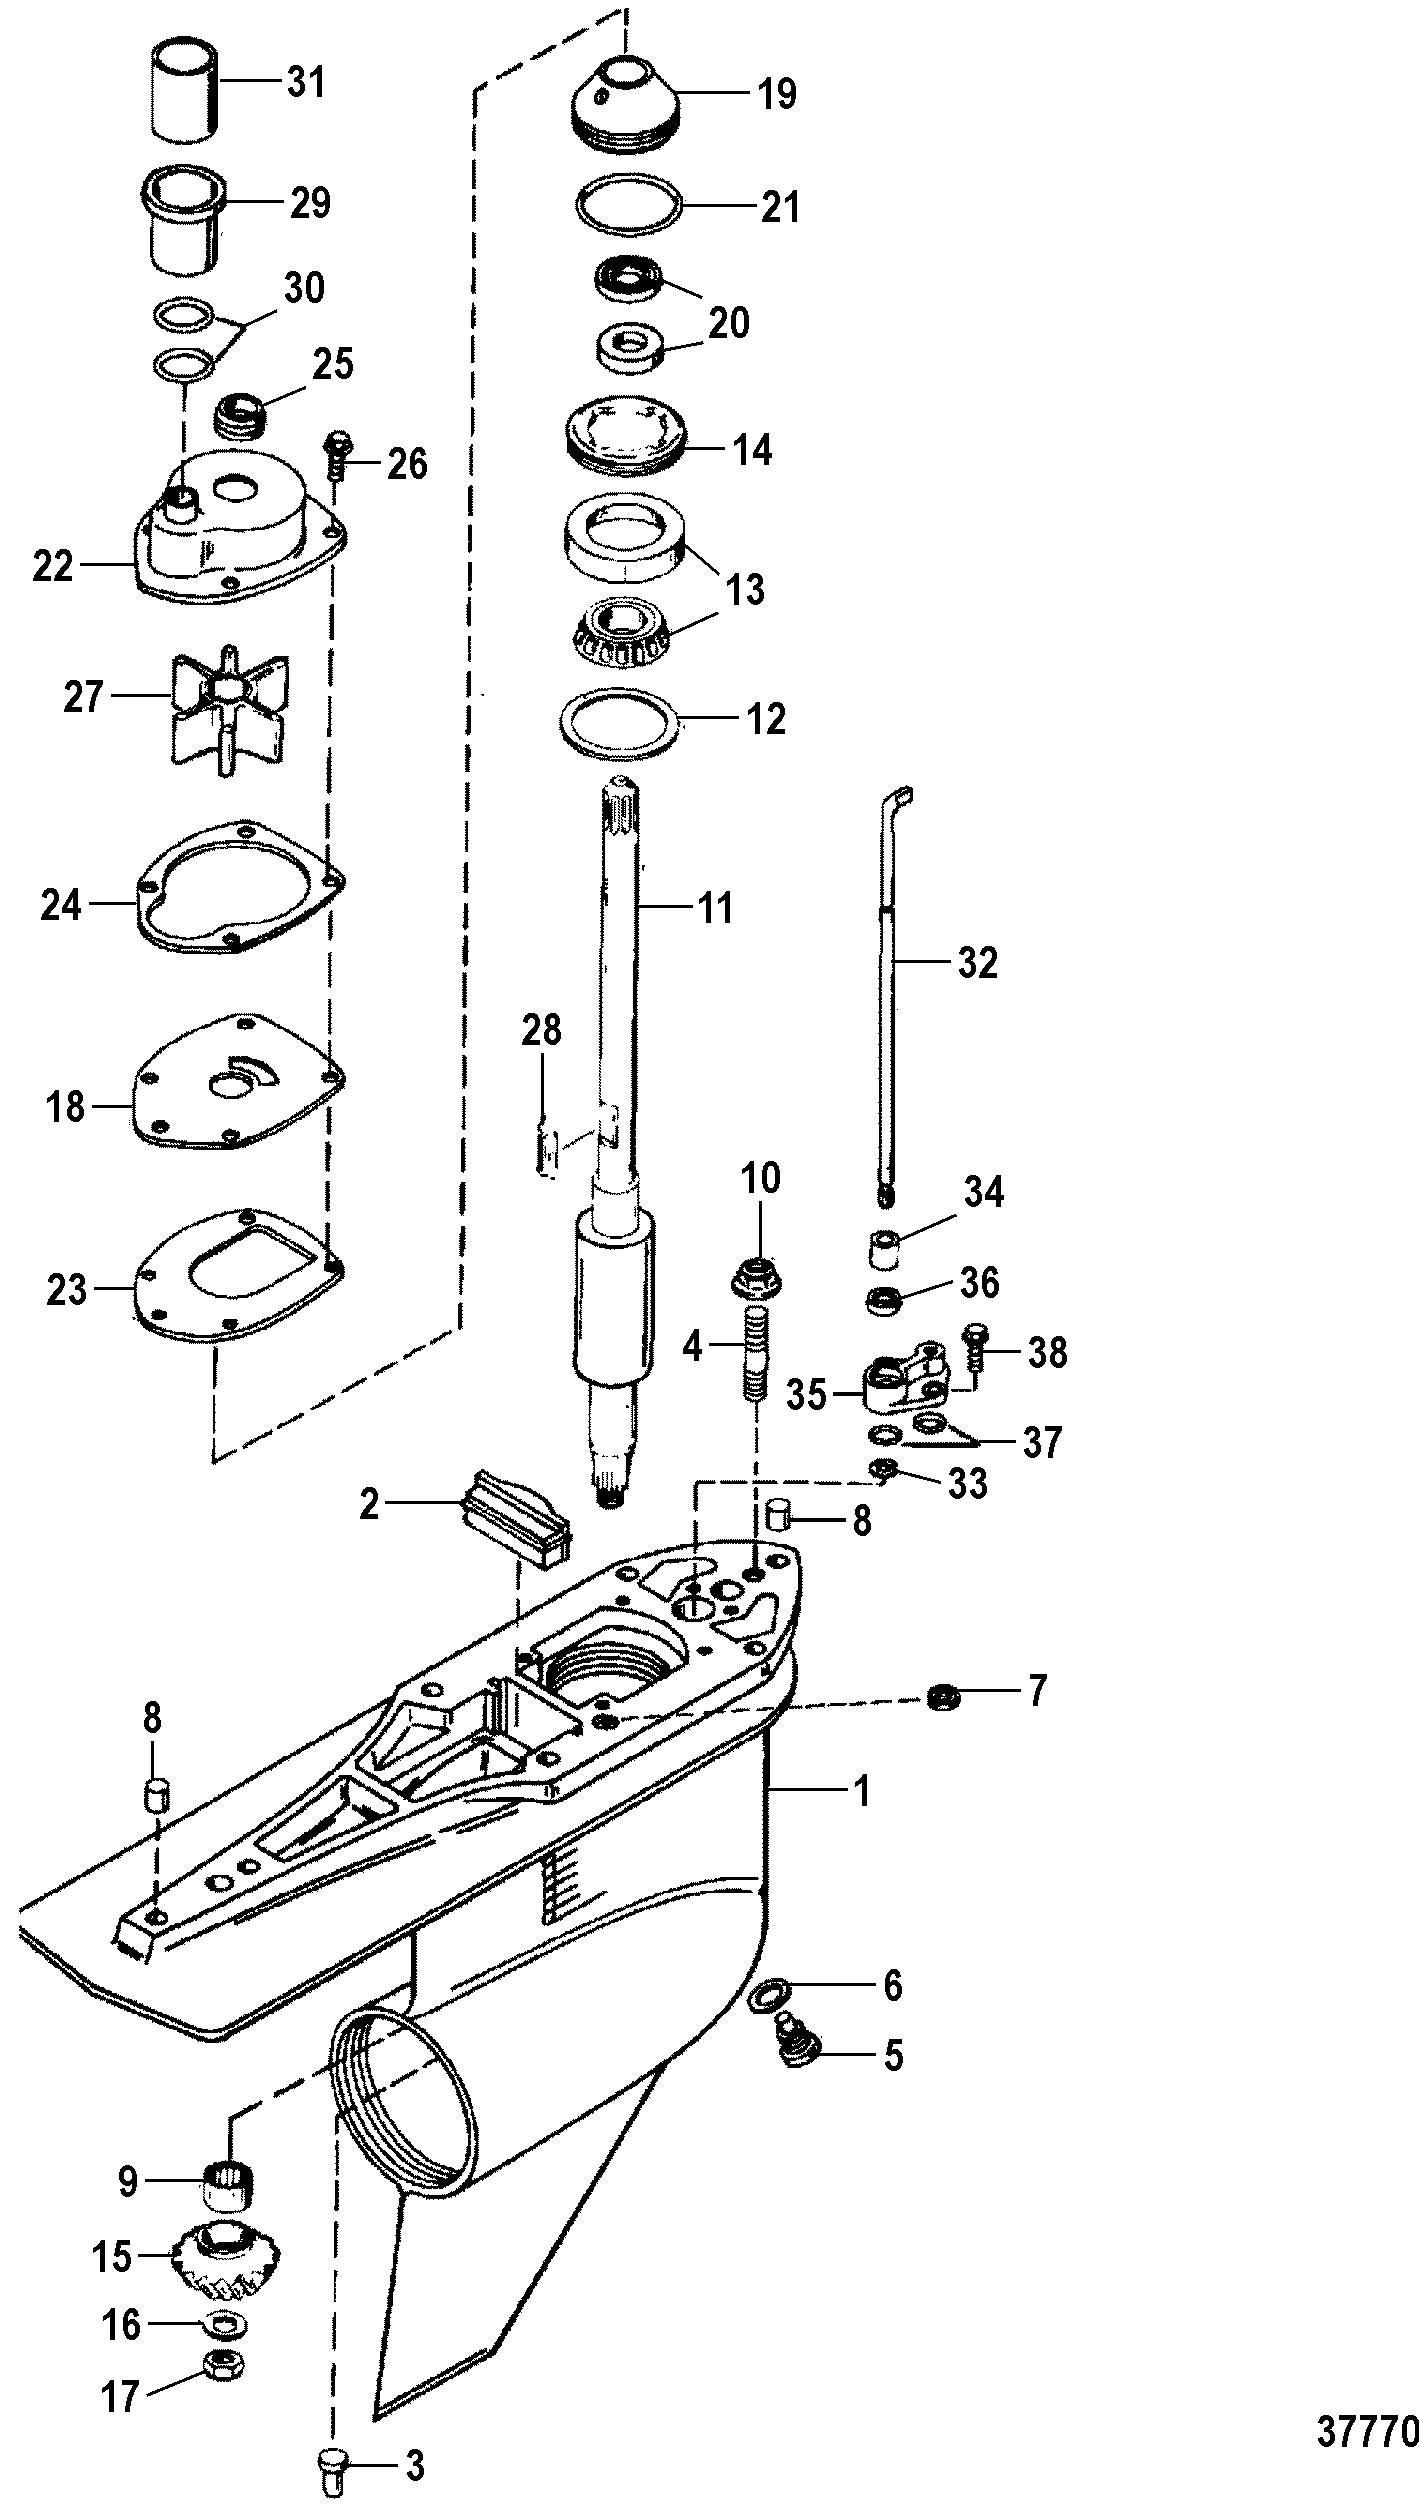 alpha one sterndrive parts diagram 1976 honda cb750 wiring gear housing driveshaft counter rotation for mercruiser